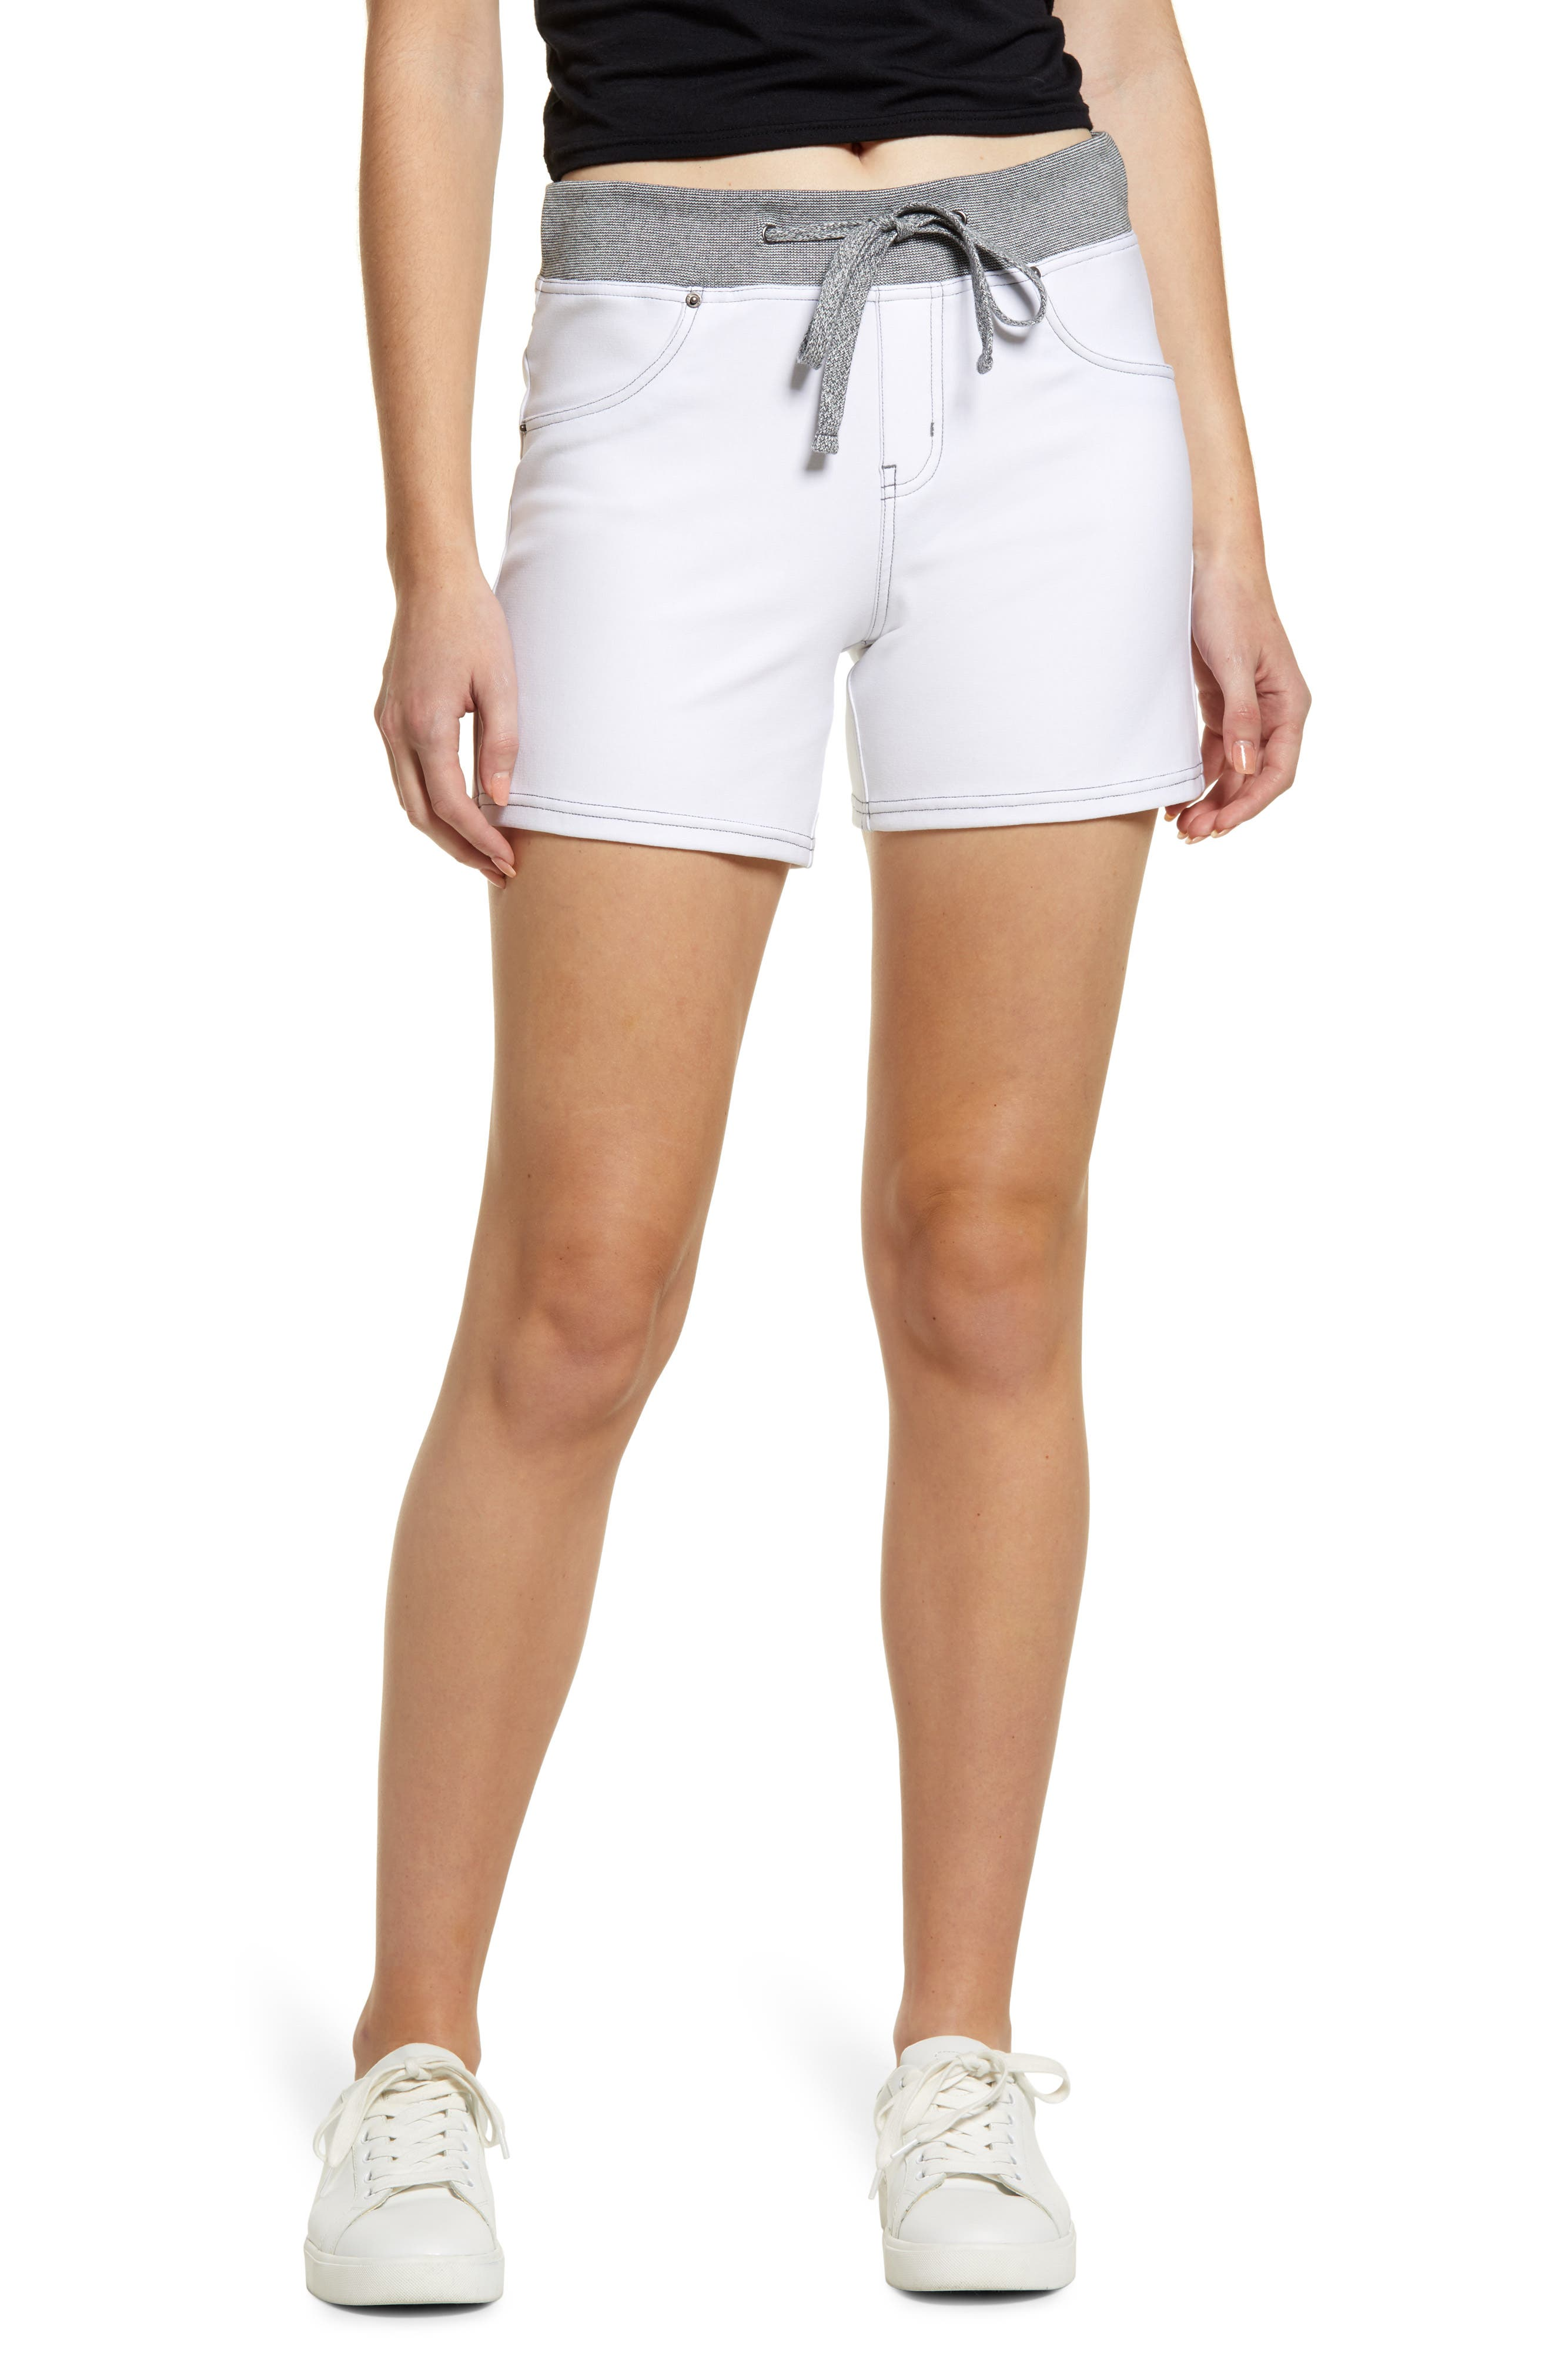 Wearever Sweatshirt Denim Shorts